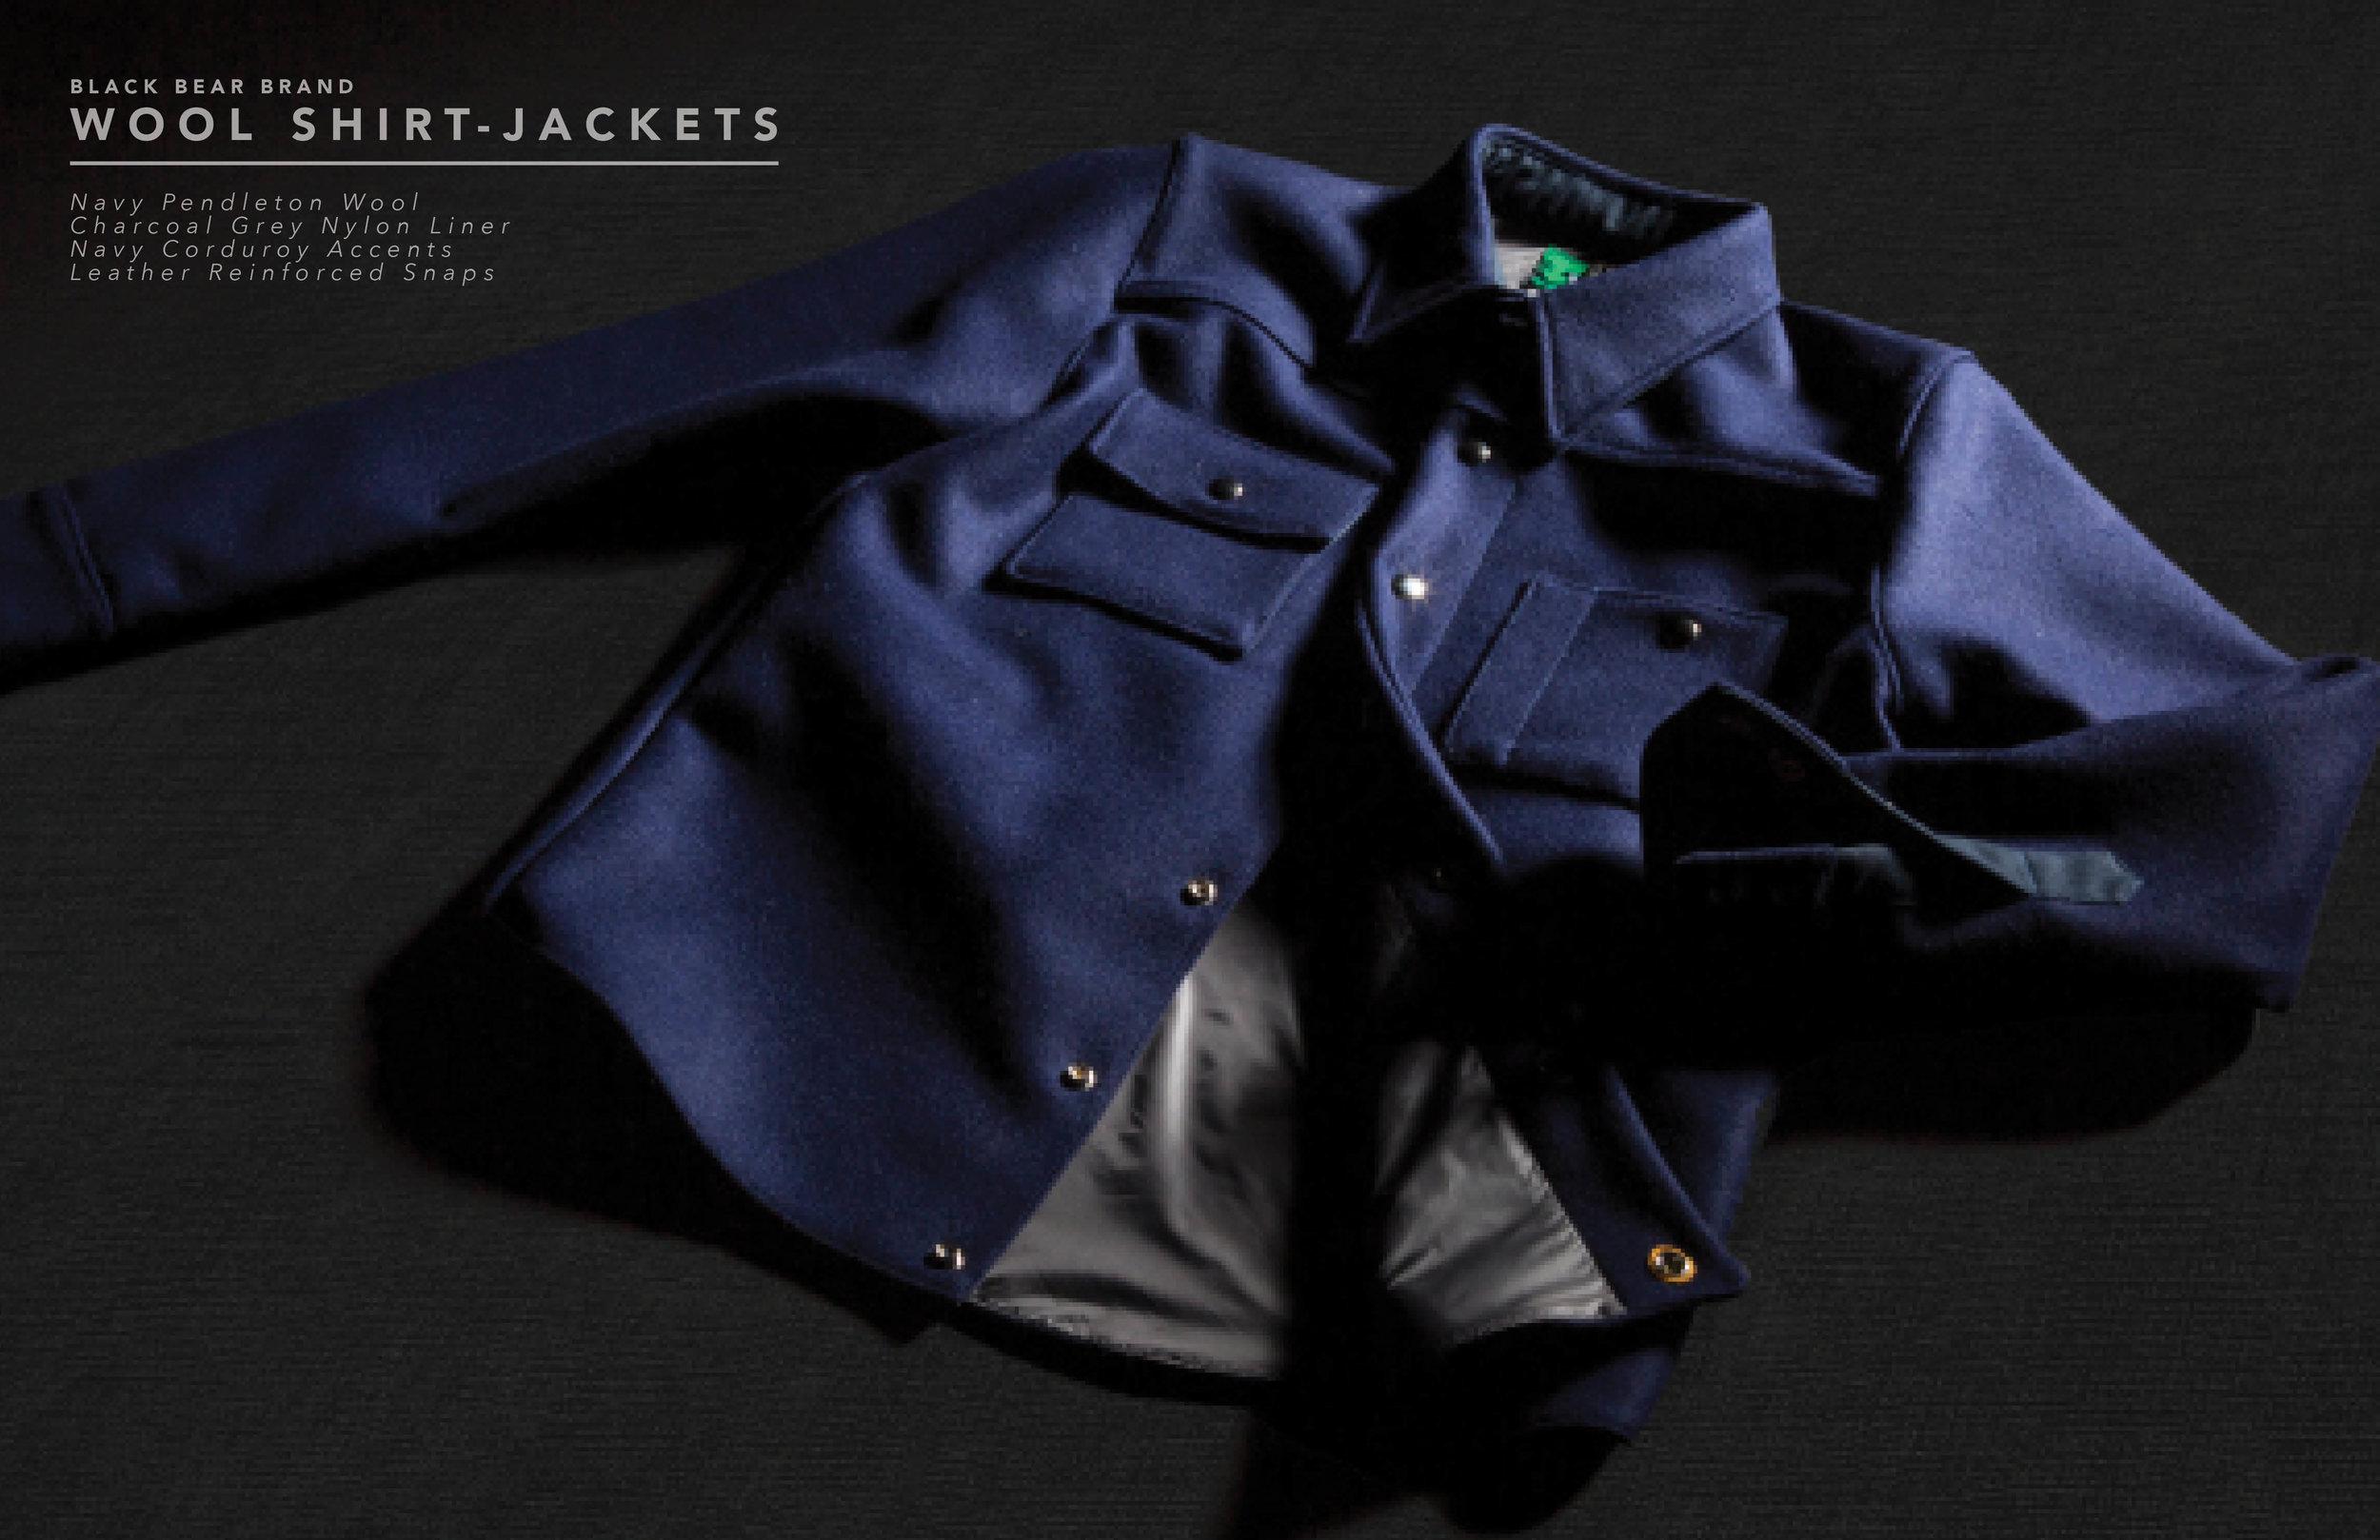 Black Bear Brand wool shirt jacket in navy